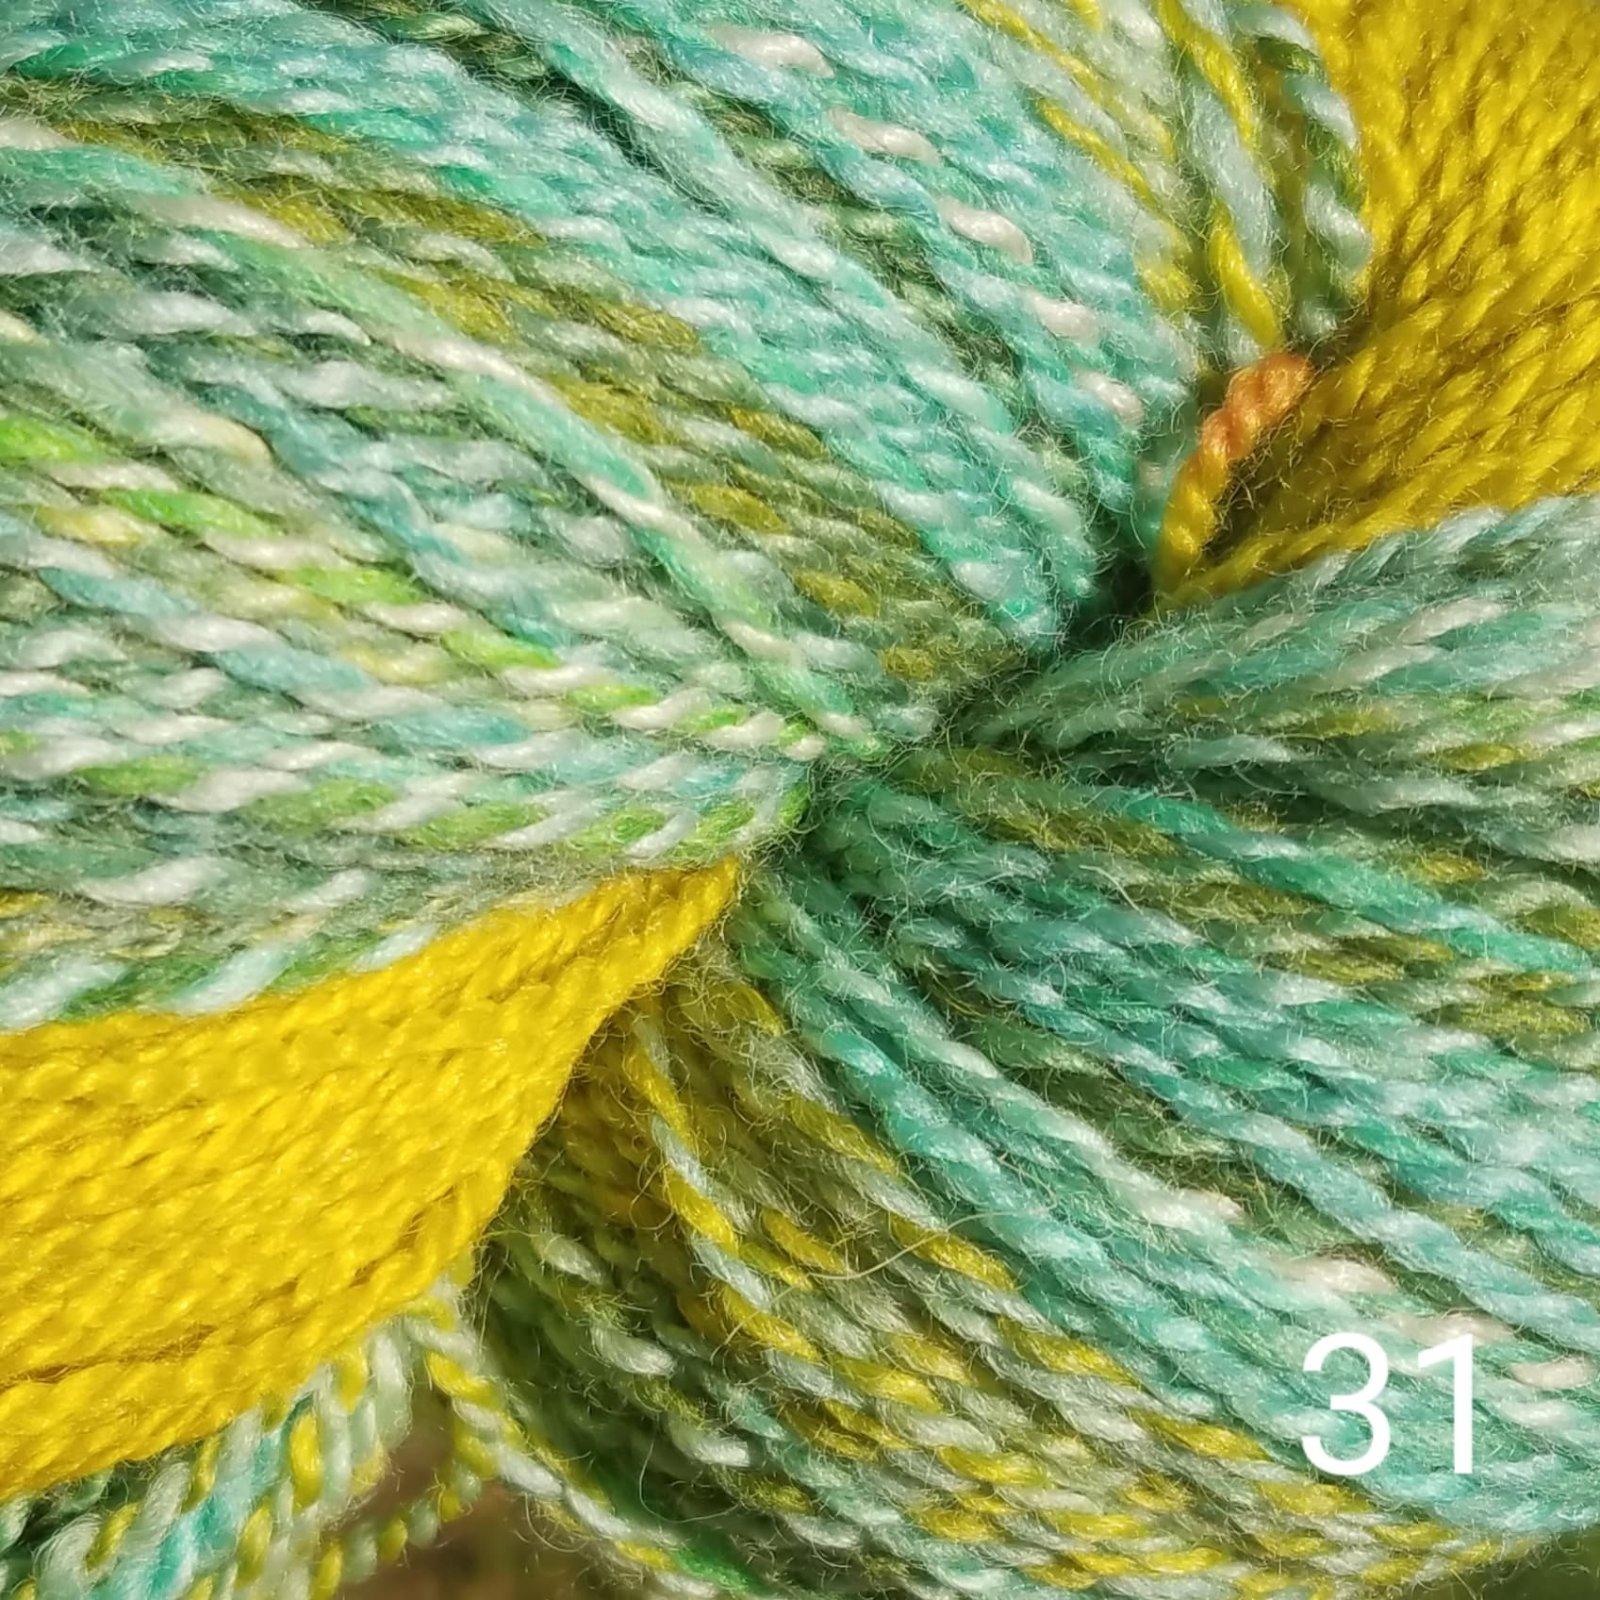 Yarn Bundle 31